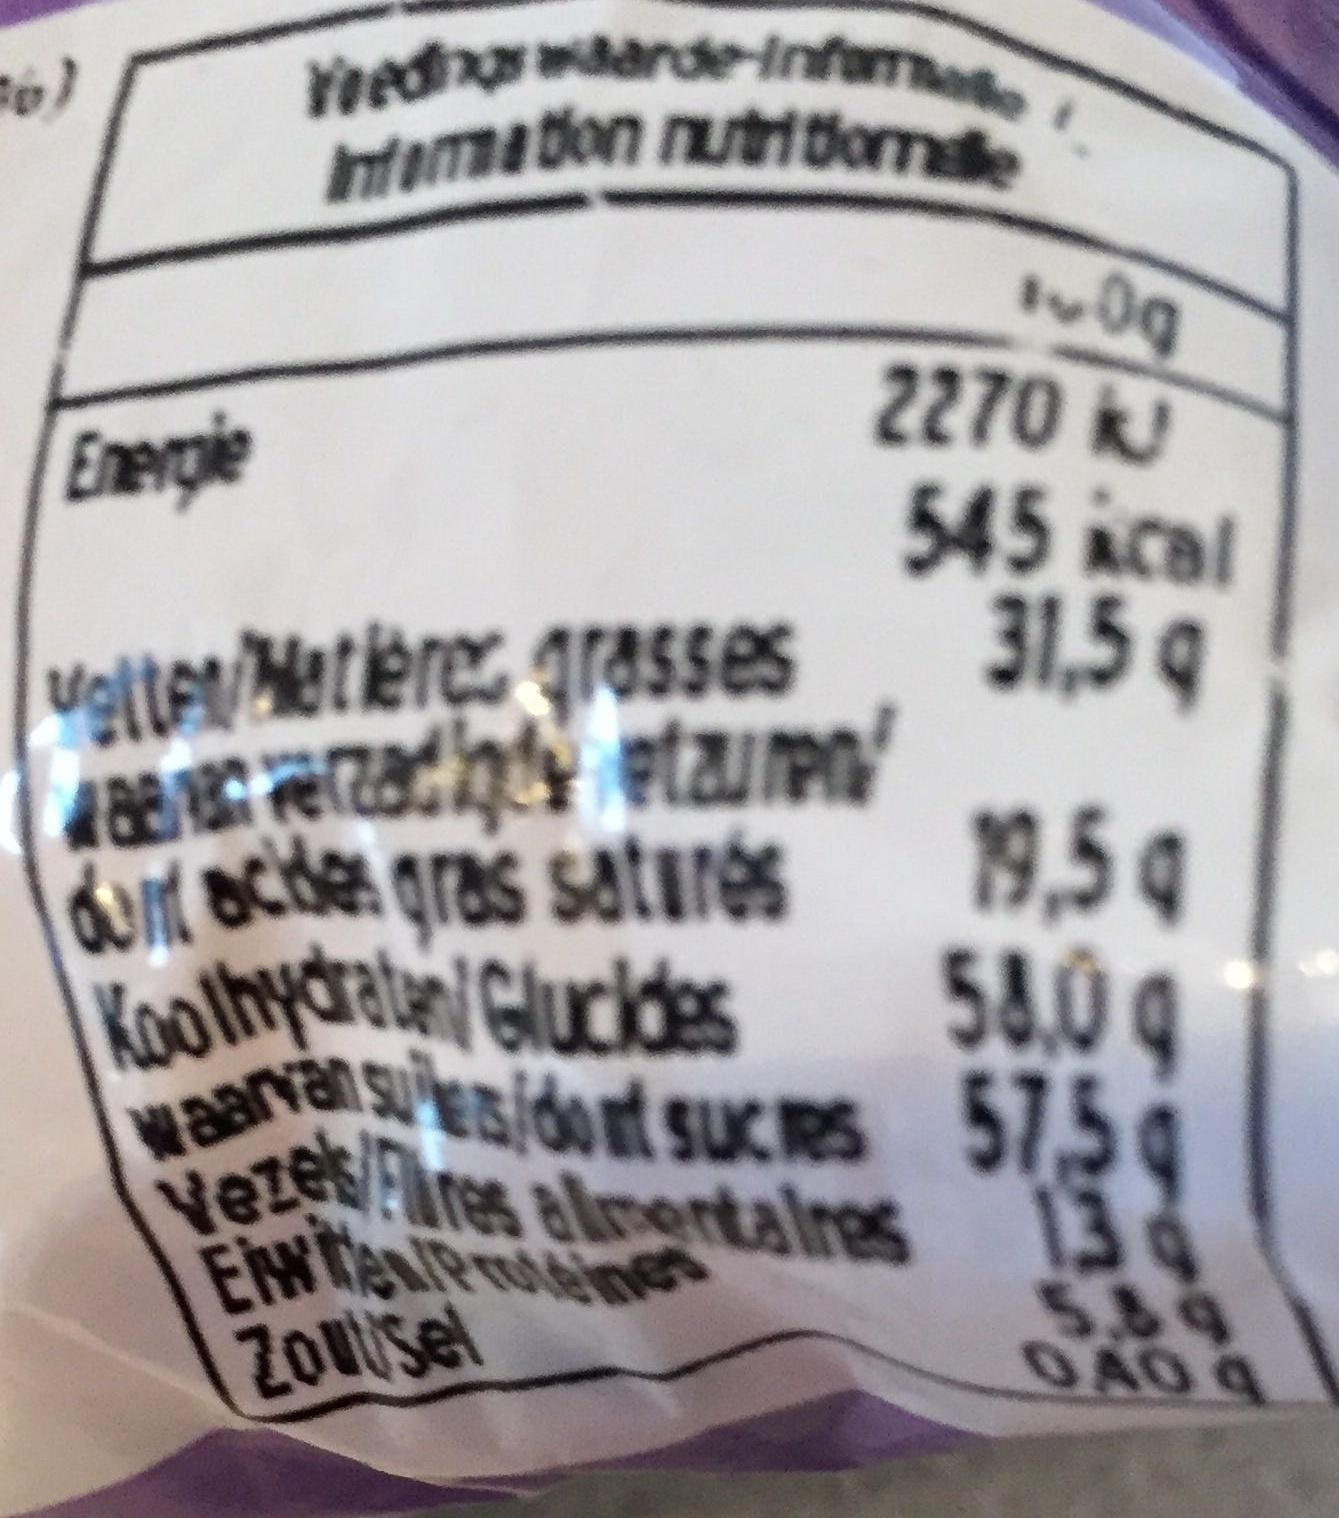 Oeufs Tendre au lait - Voedingswaarden - fr